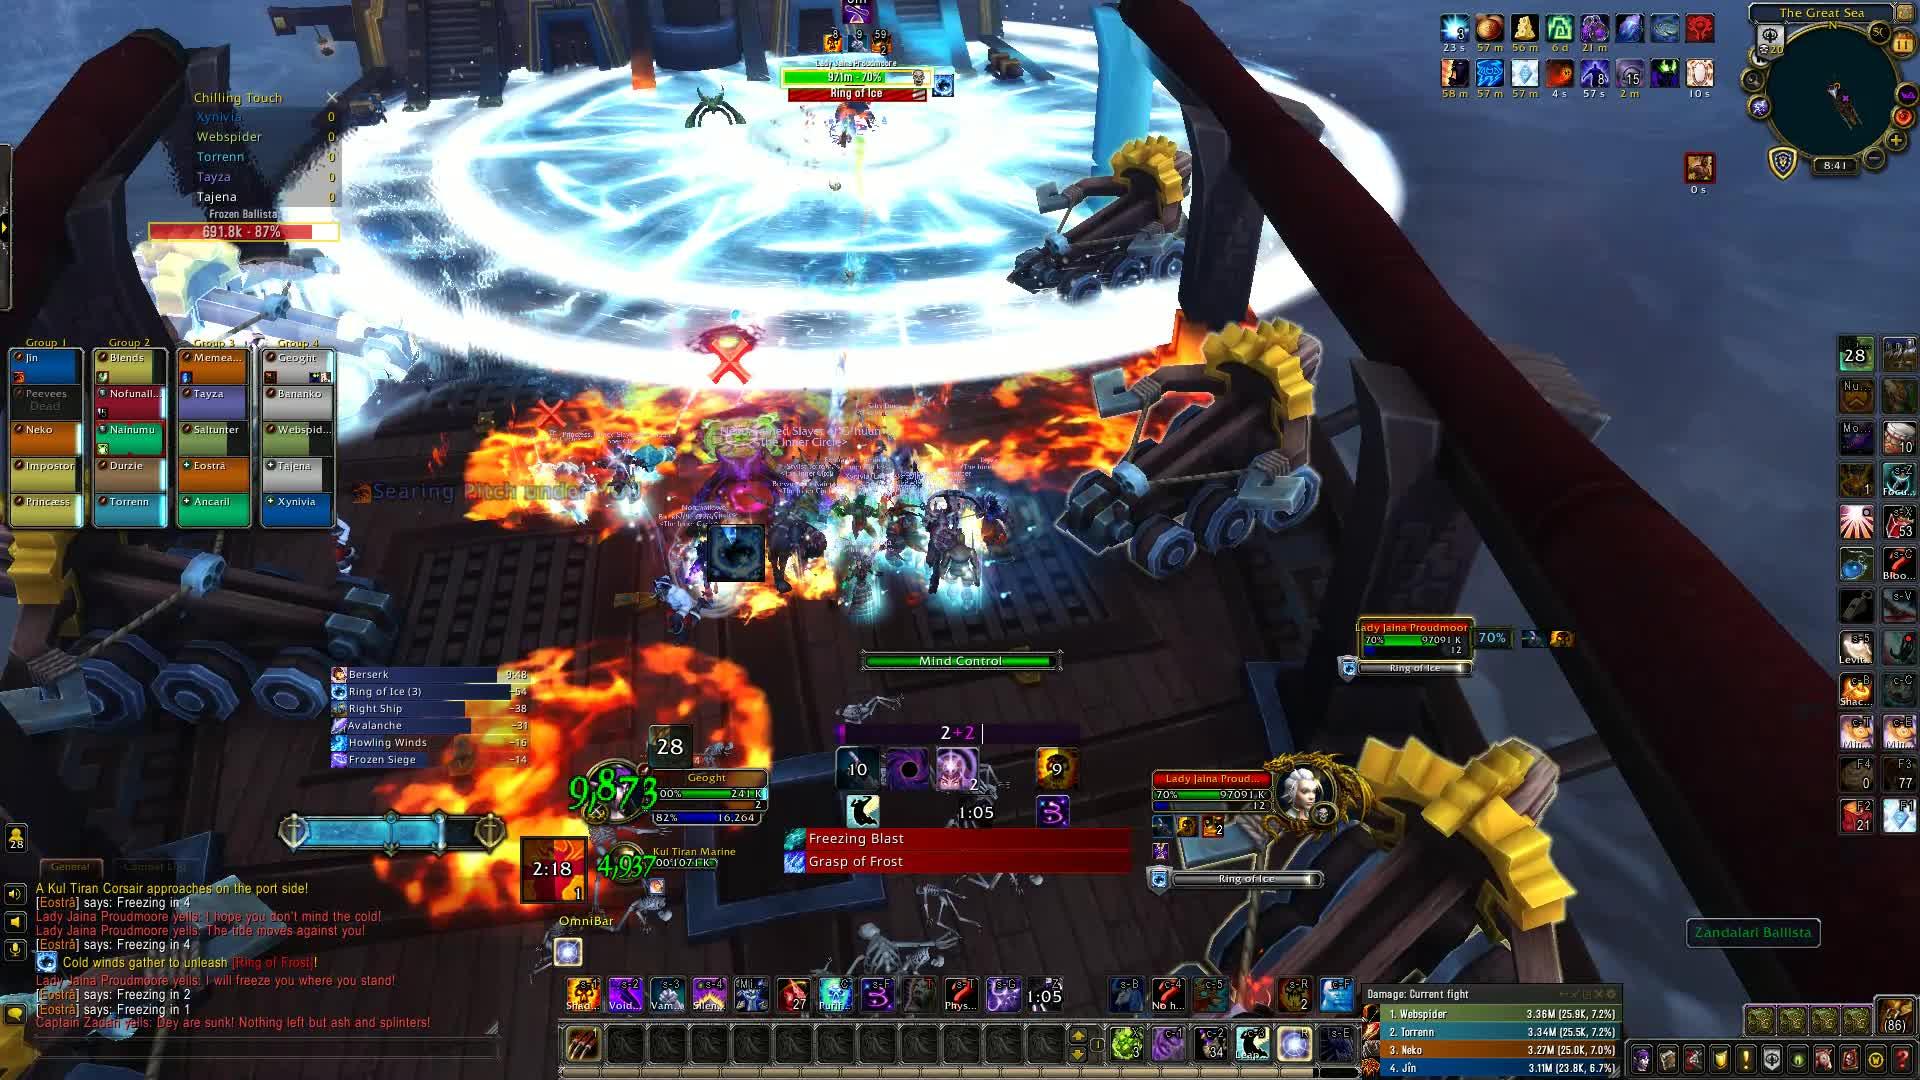 worldofwarcraft, World Of Warcraft 2019.04.11 - 20.41.55.06.DVR GIFs